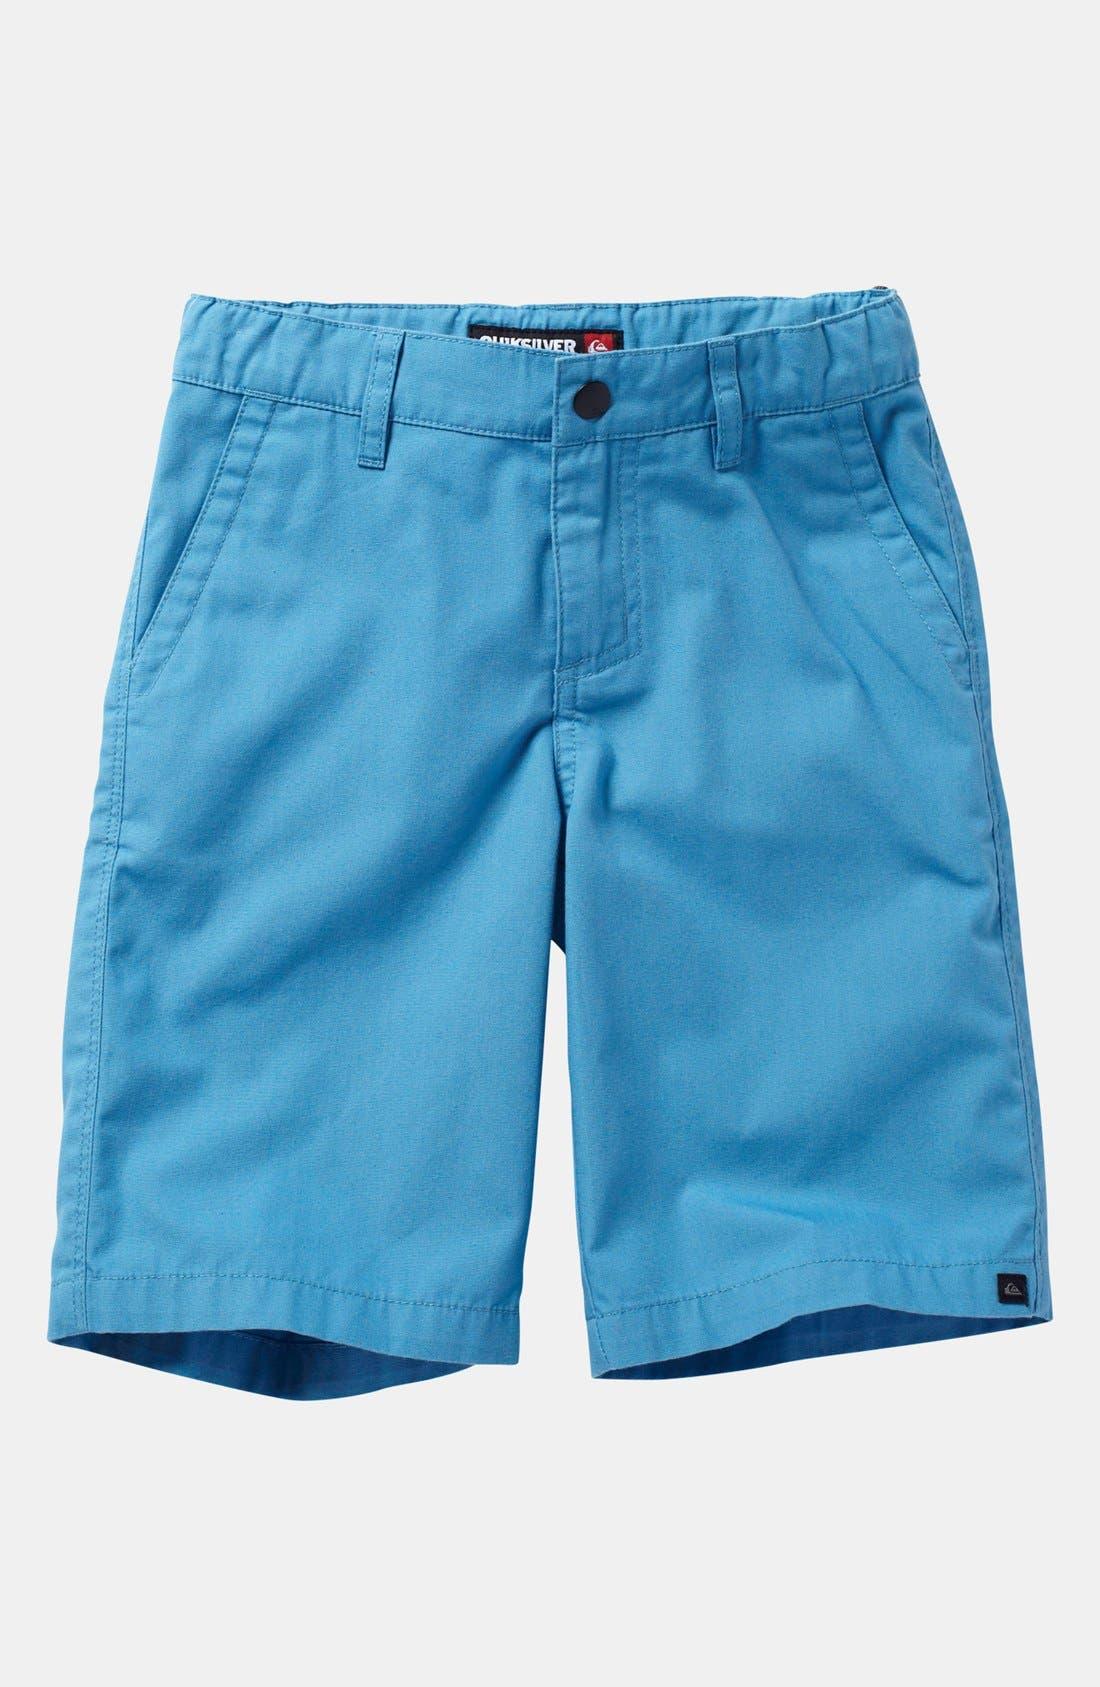 Main Image - Quiksilver 'Rockford' Shorts (Baby)